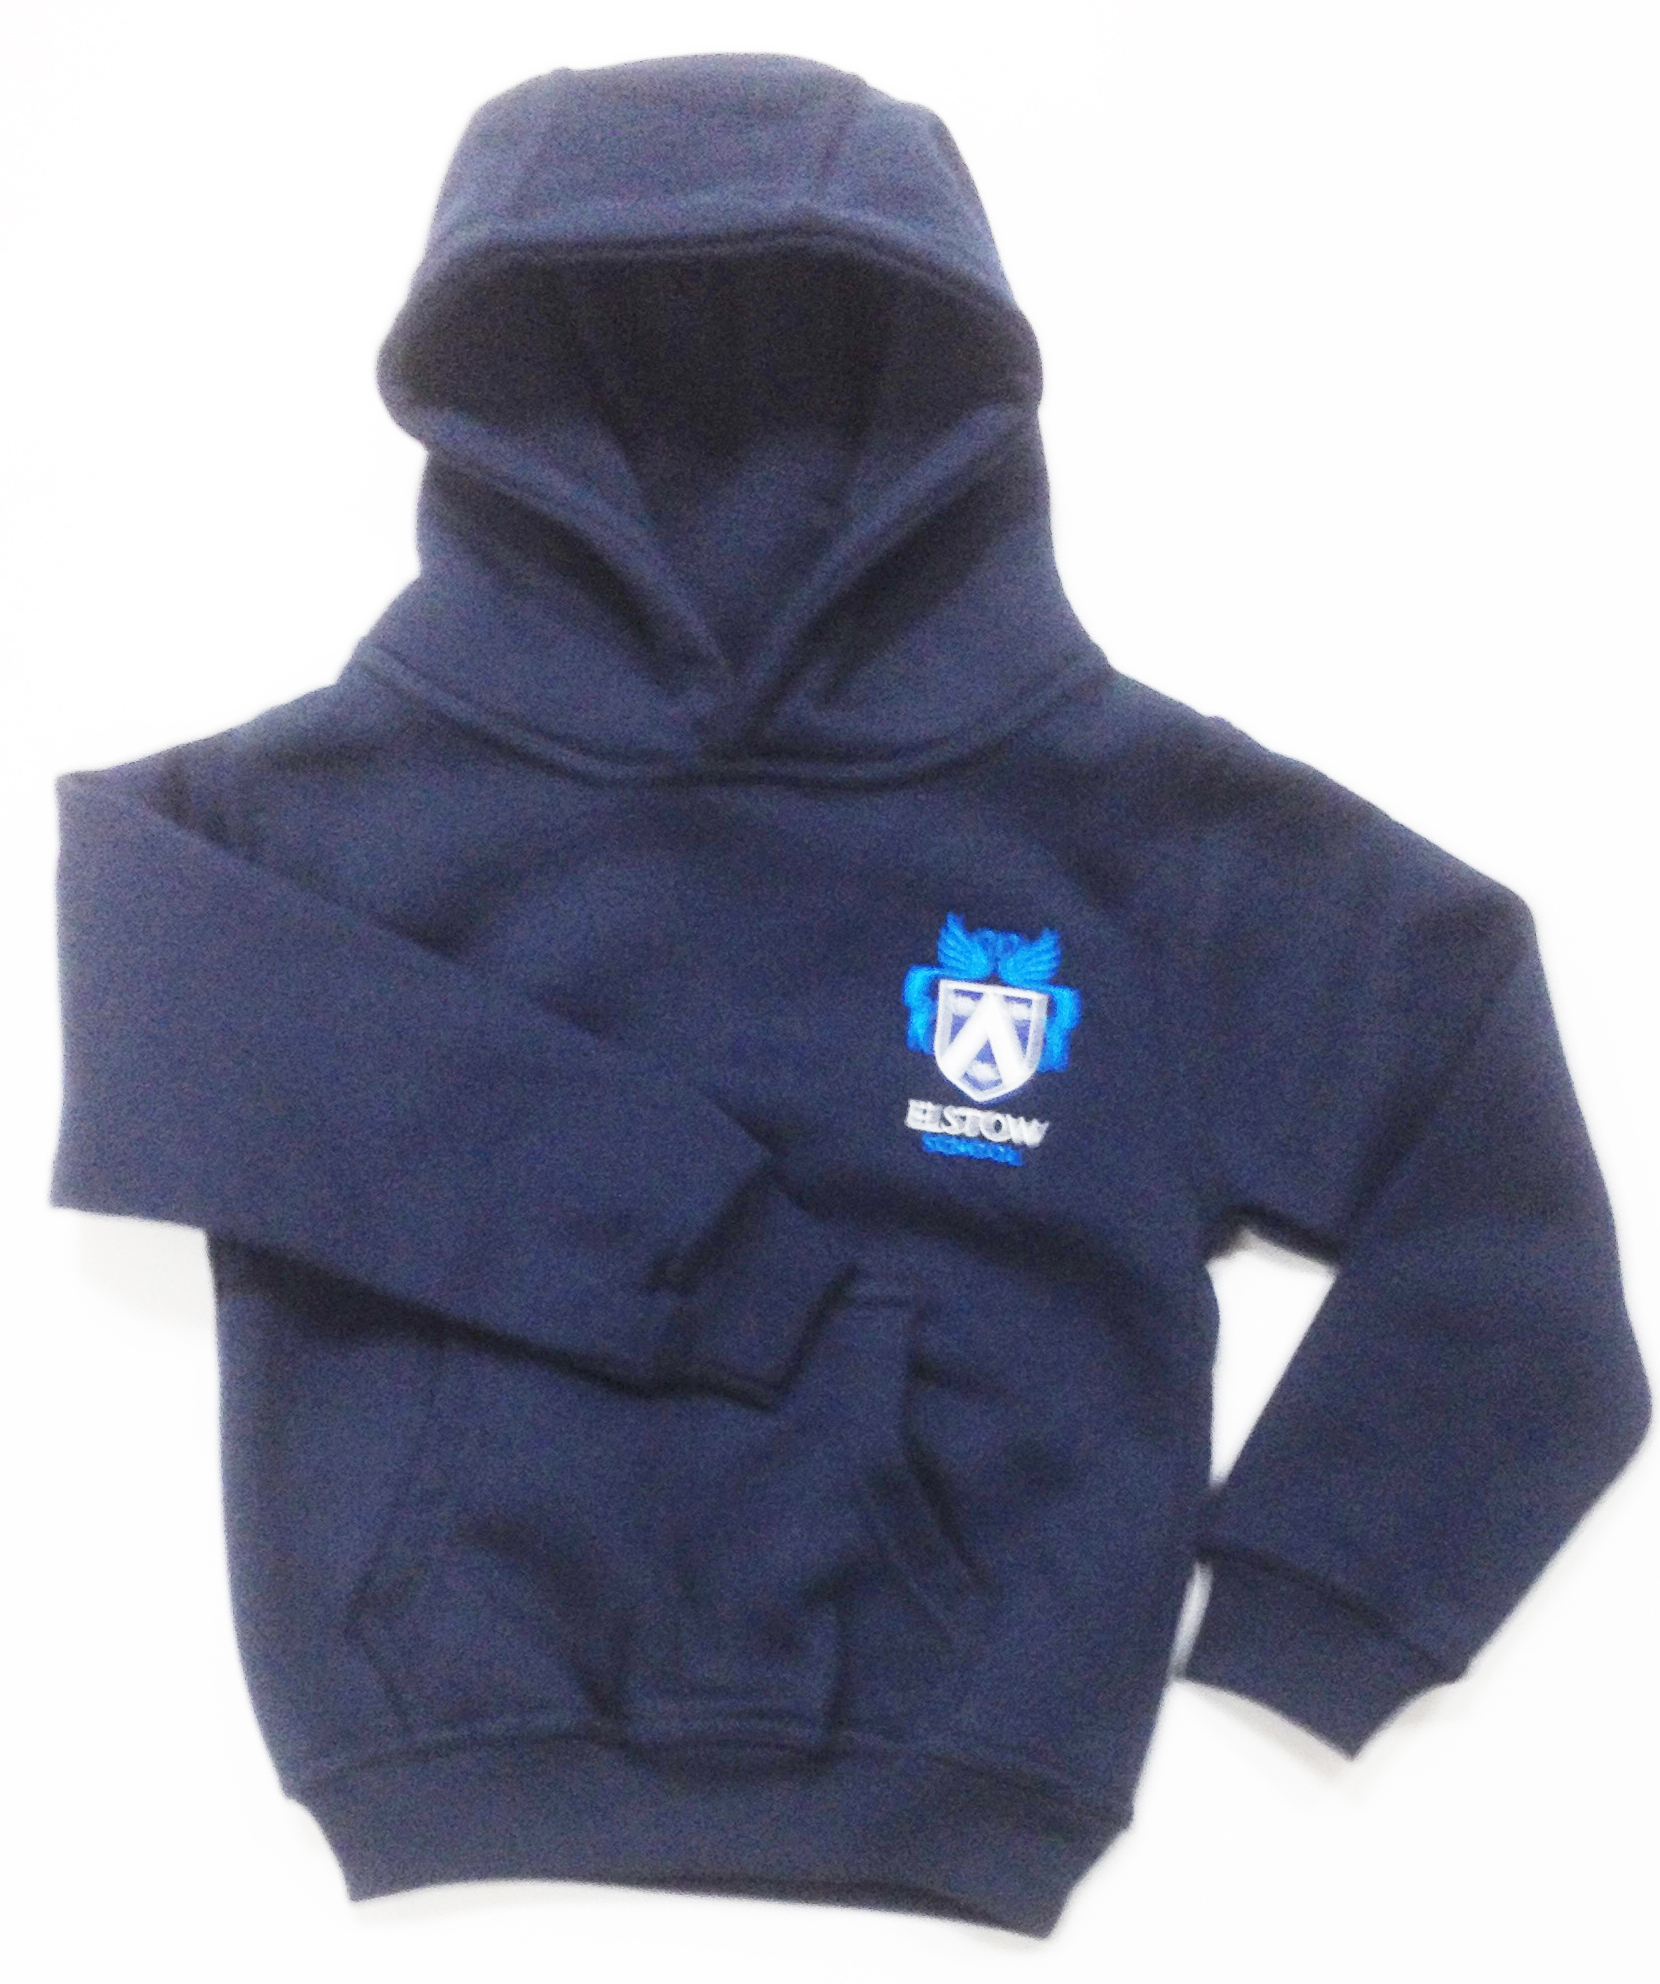 080b2e45b174 Elstow School Sports Hoodie (Navy)